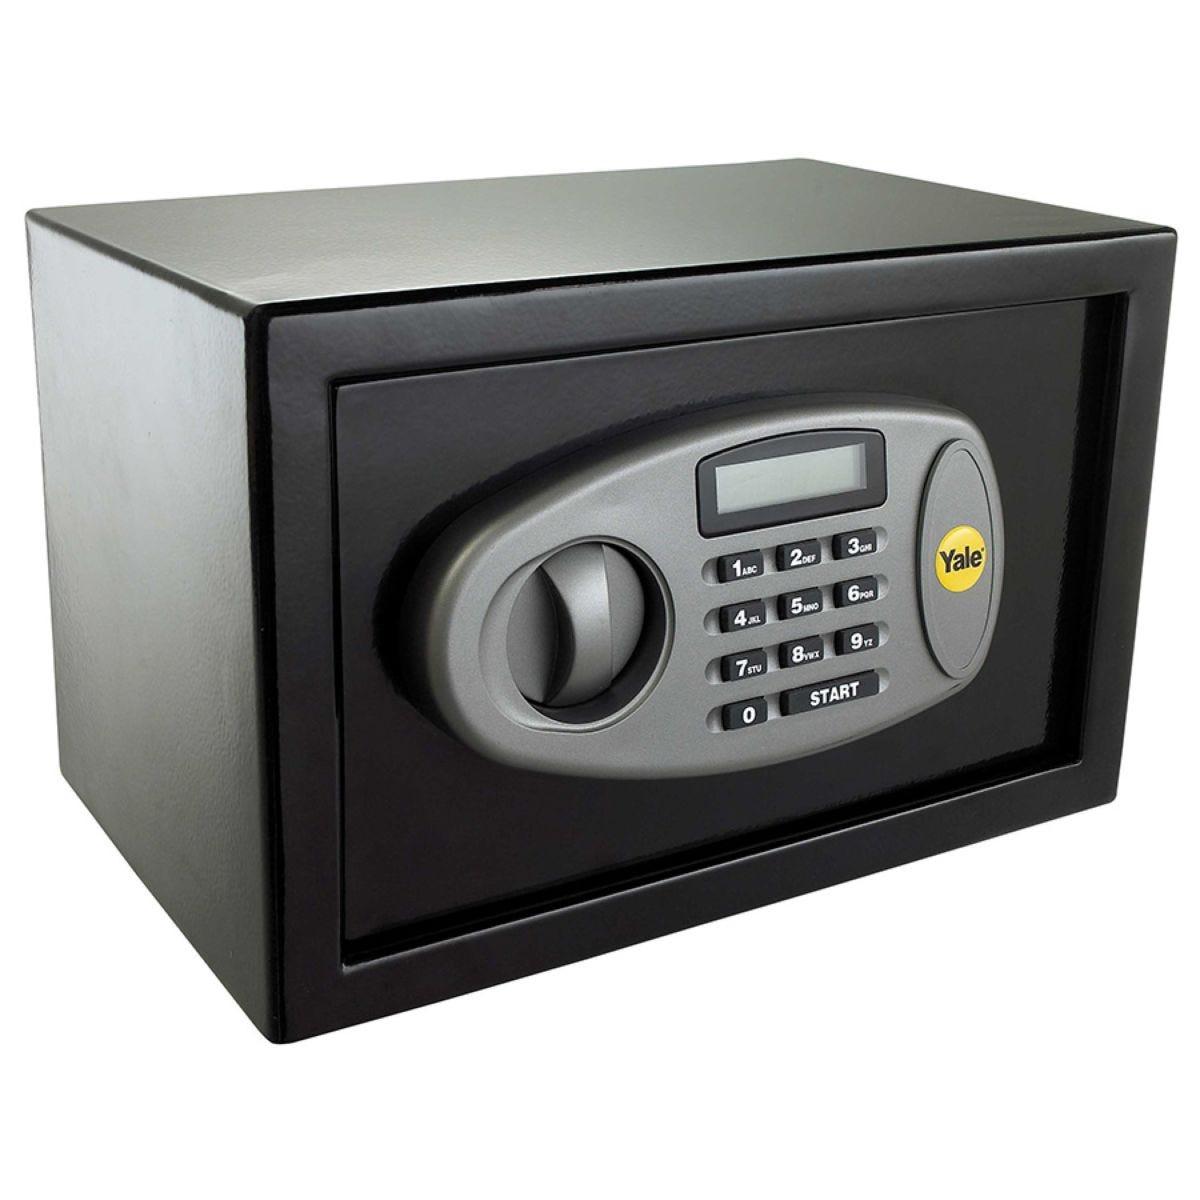 Yale Medium Digital Safe - Black